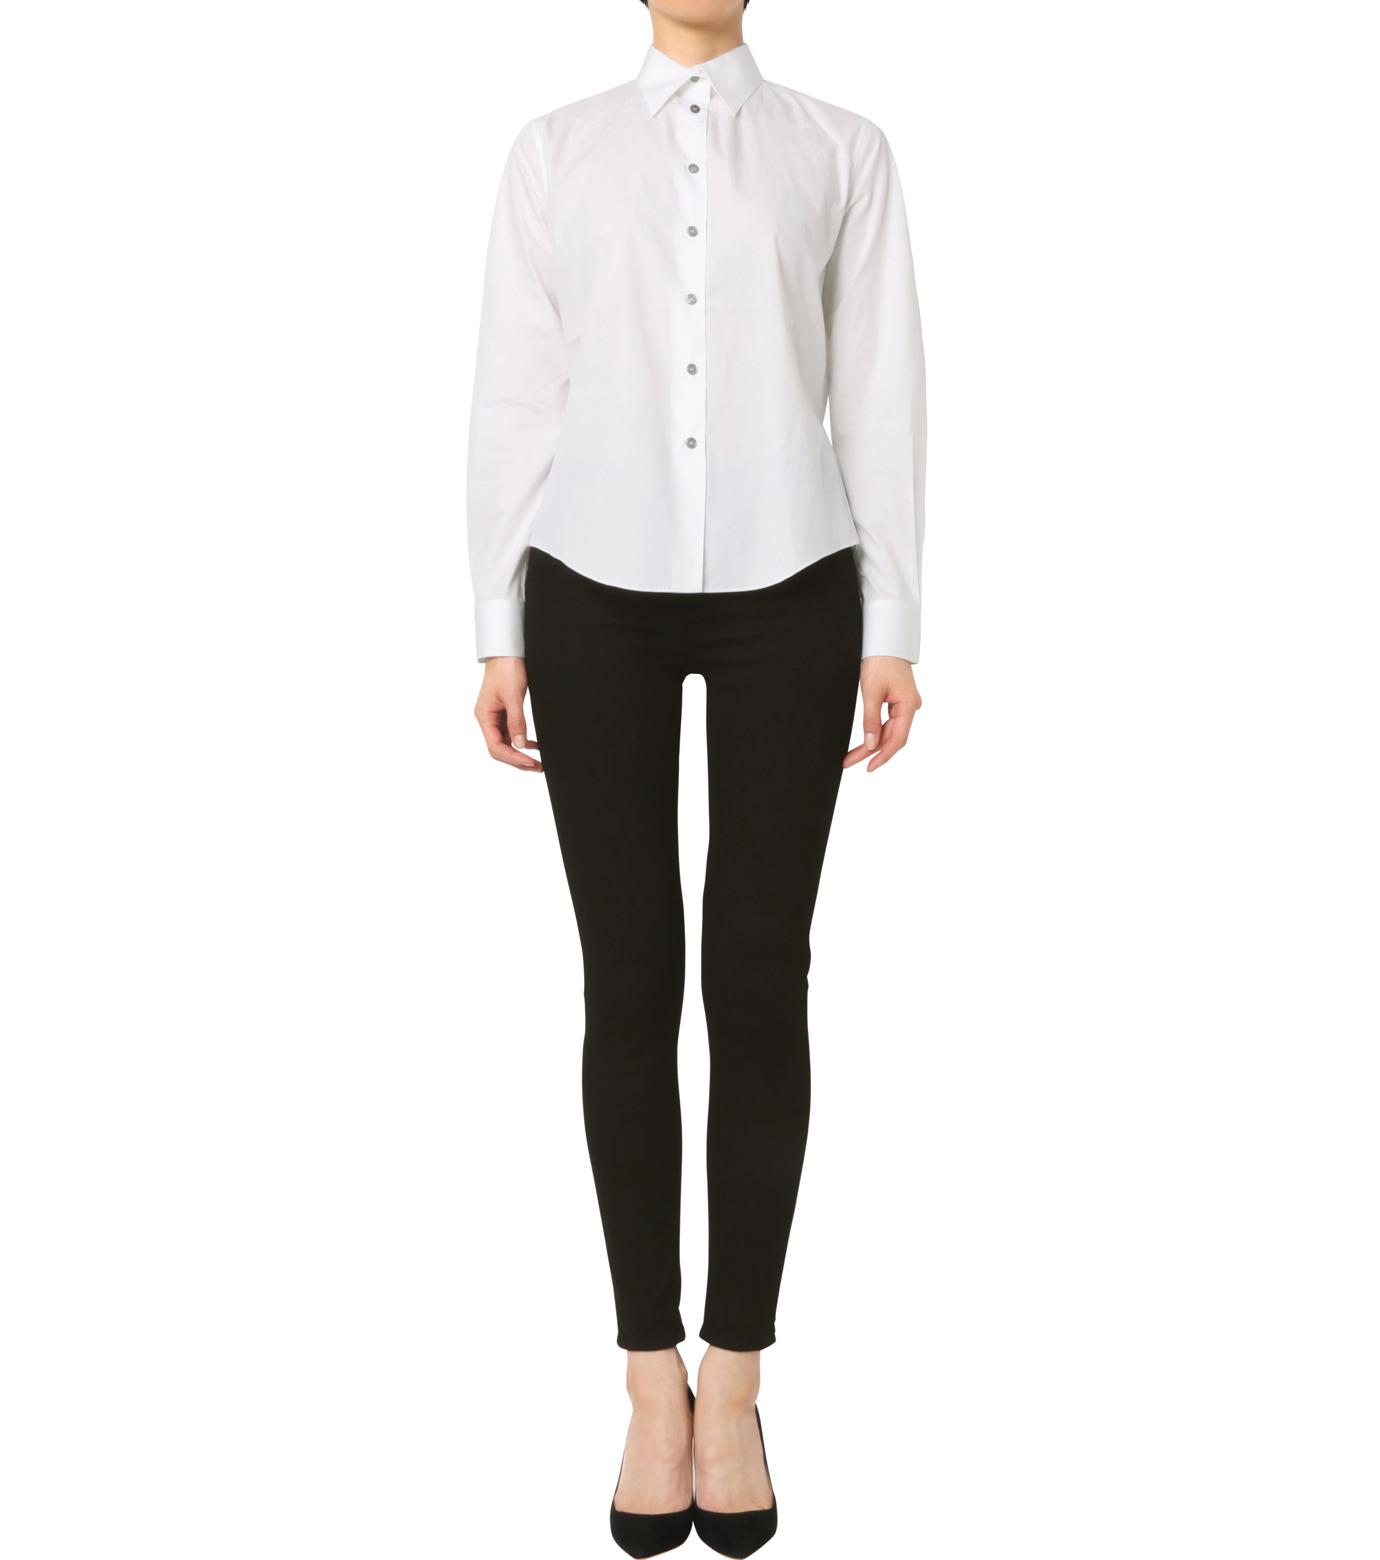 Jourden(ジョーダン)のWhite Shirt w/Ruffle Back Slit-WHITE(シャツ/shirt)-1603WC1TH01-4 拡大詳細画像3